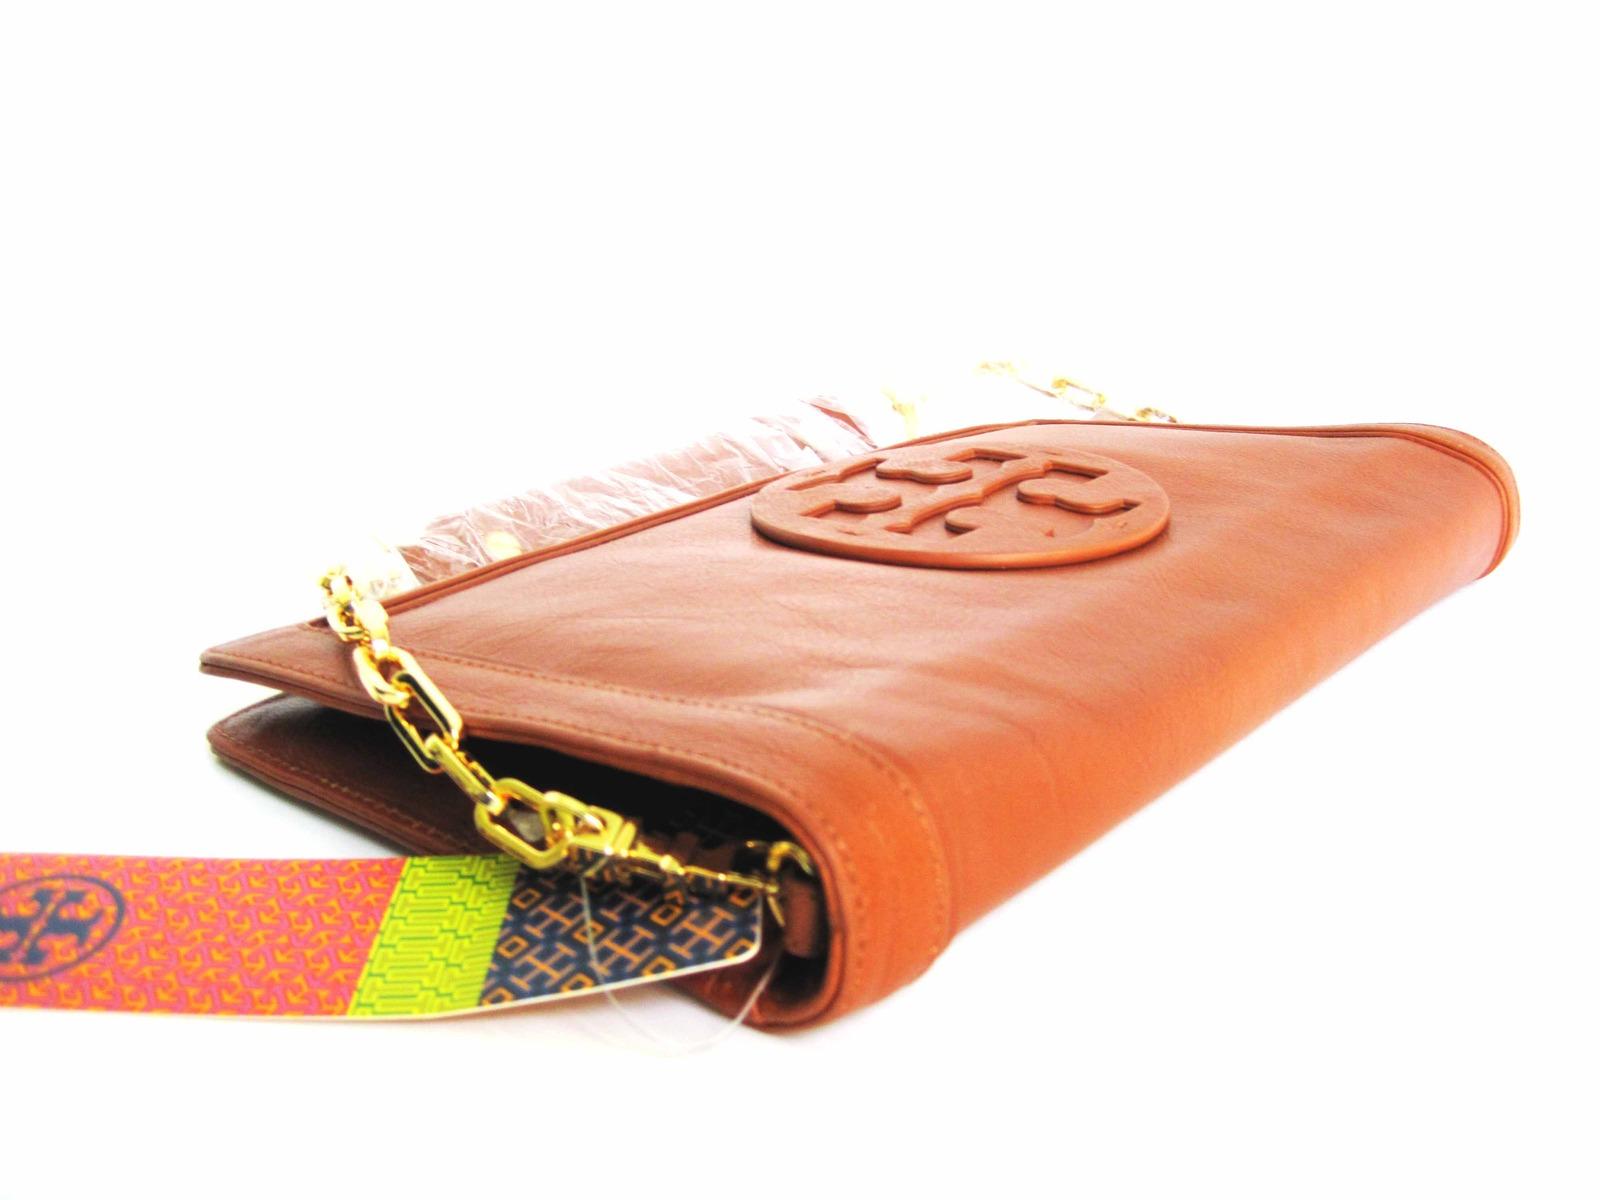 Tory Burch SUKI REVA Clutch Purse Shoulder Handbag Brown image 4